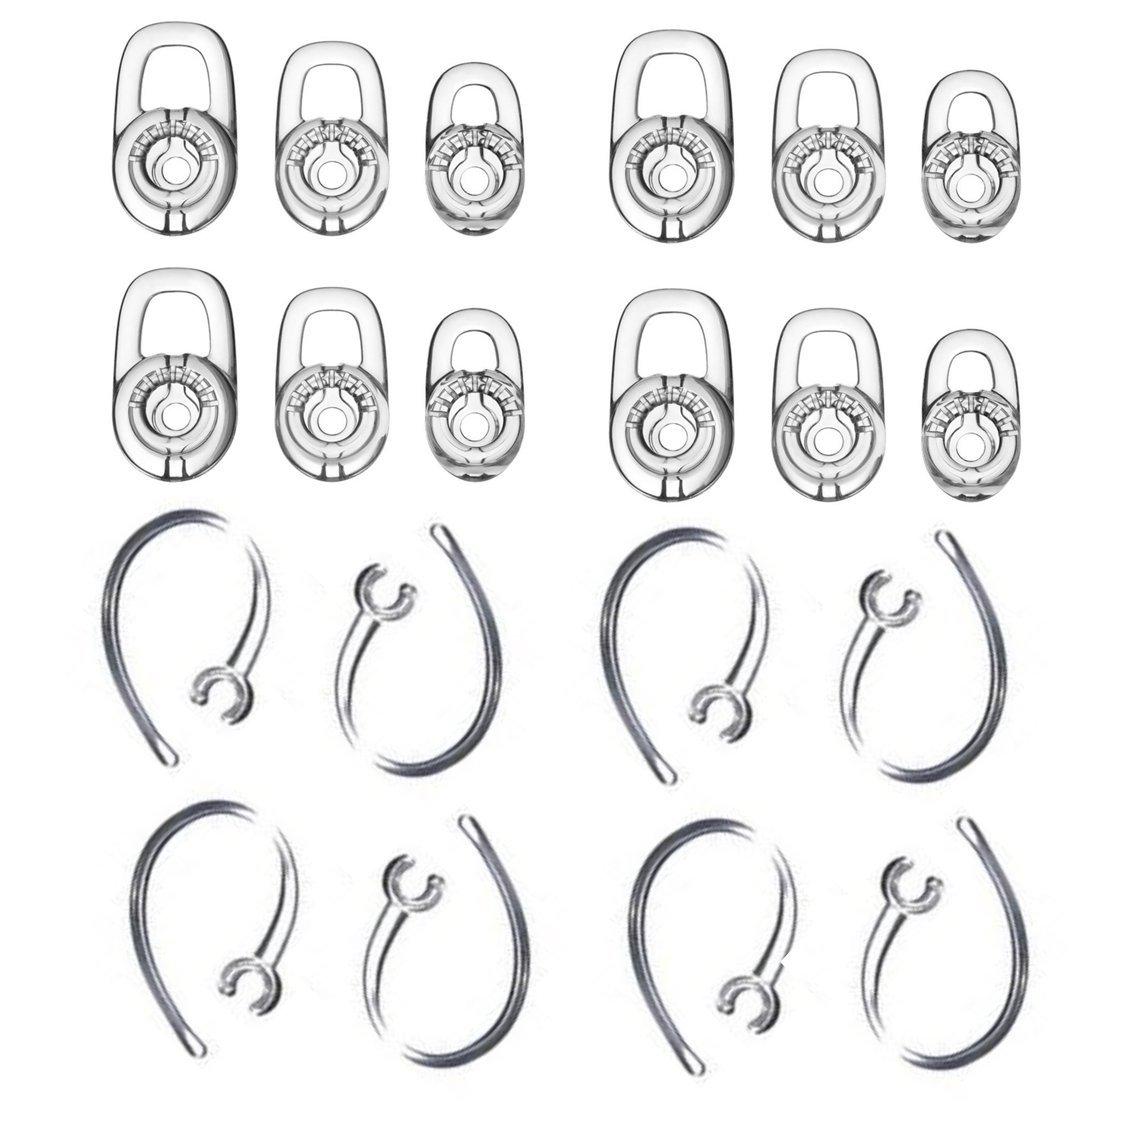 Almohadillas Auriculares PLANTRONICS 12 PCS (SMALL/MEDIUM/LA